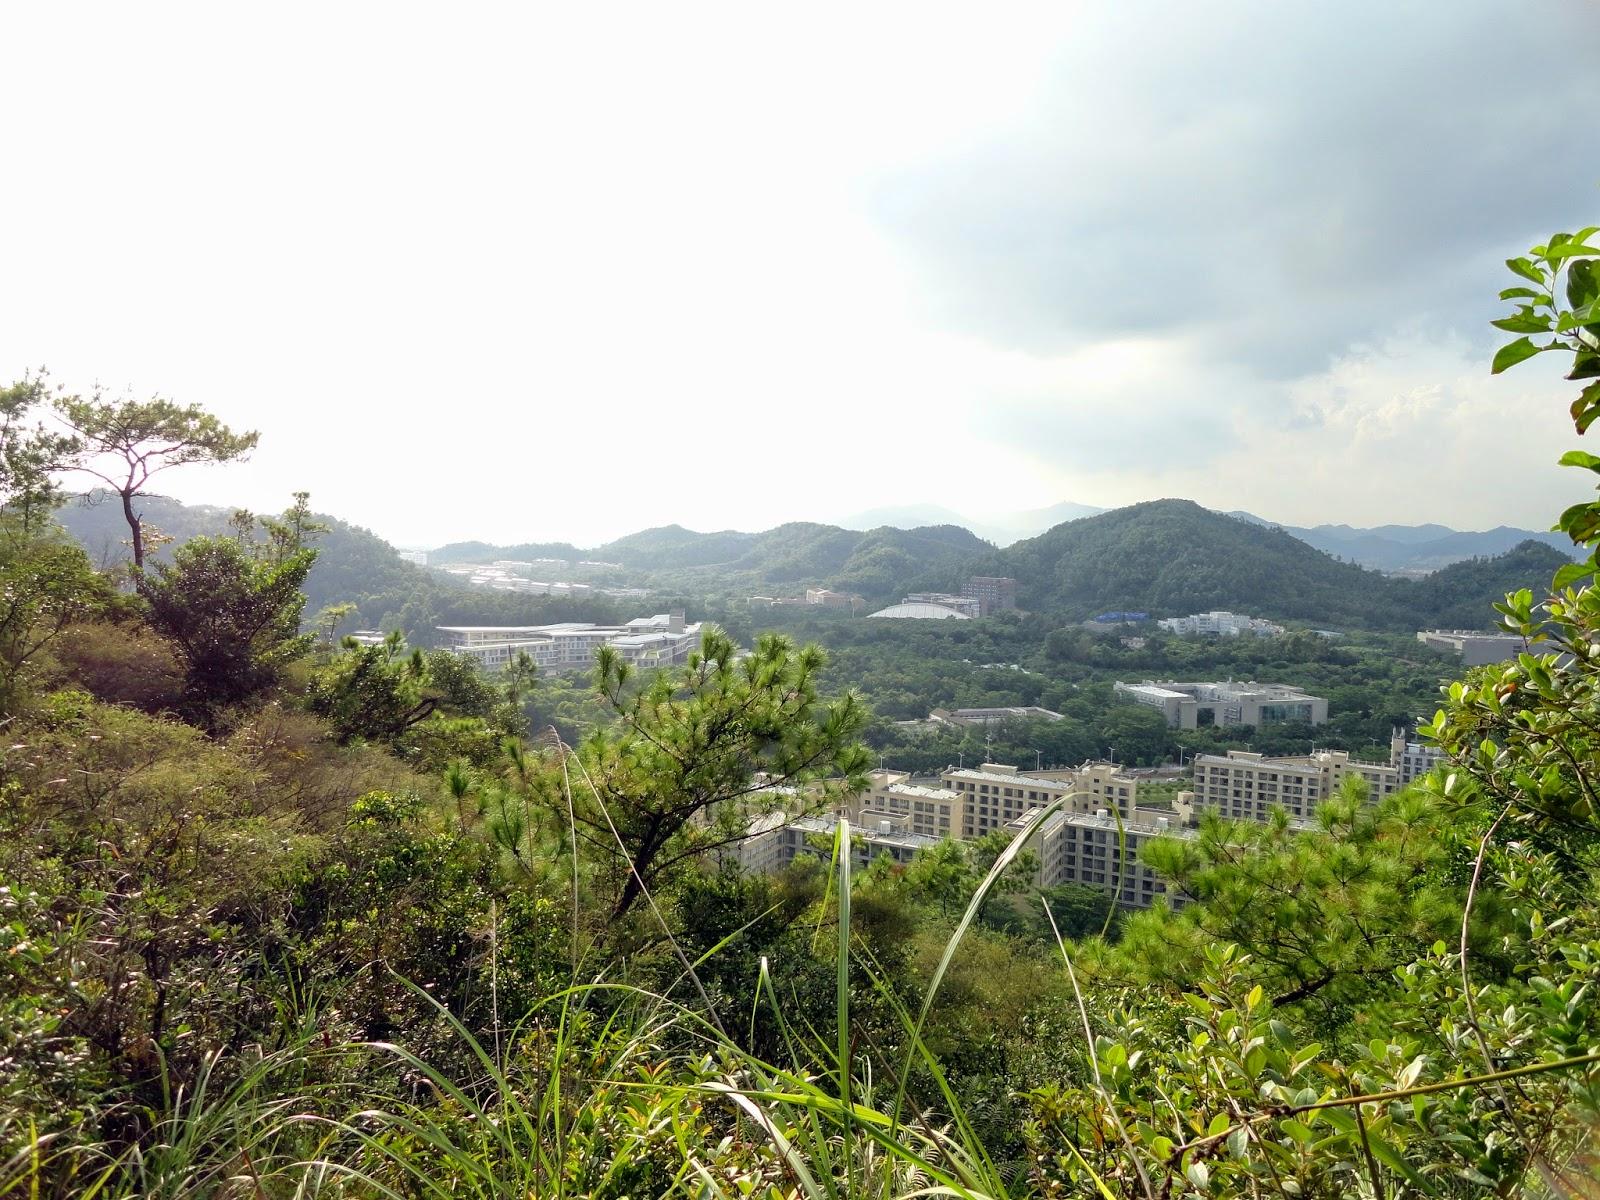 Hiking Mountains in ZhuHai